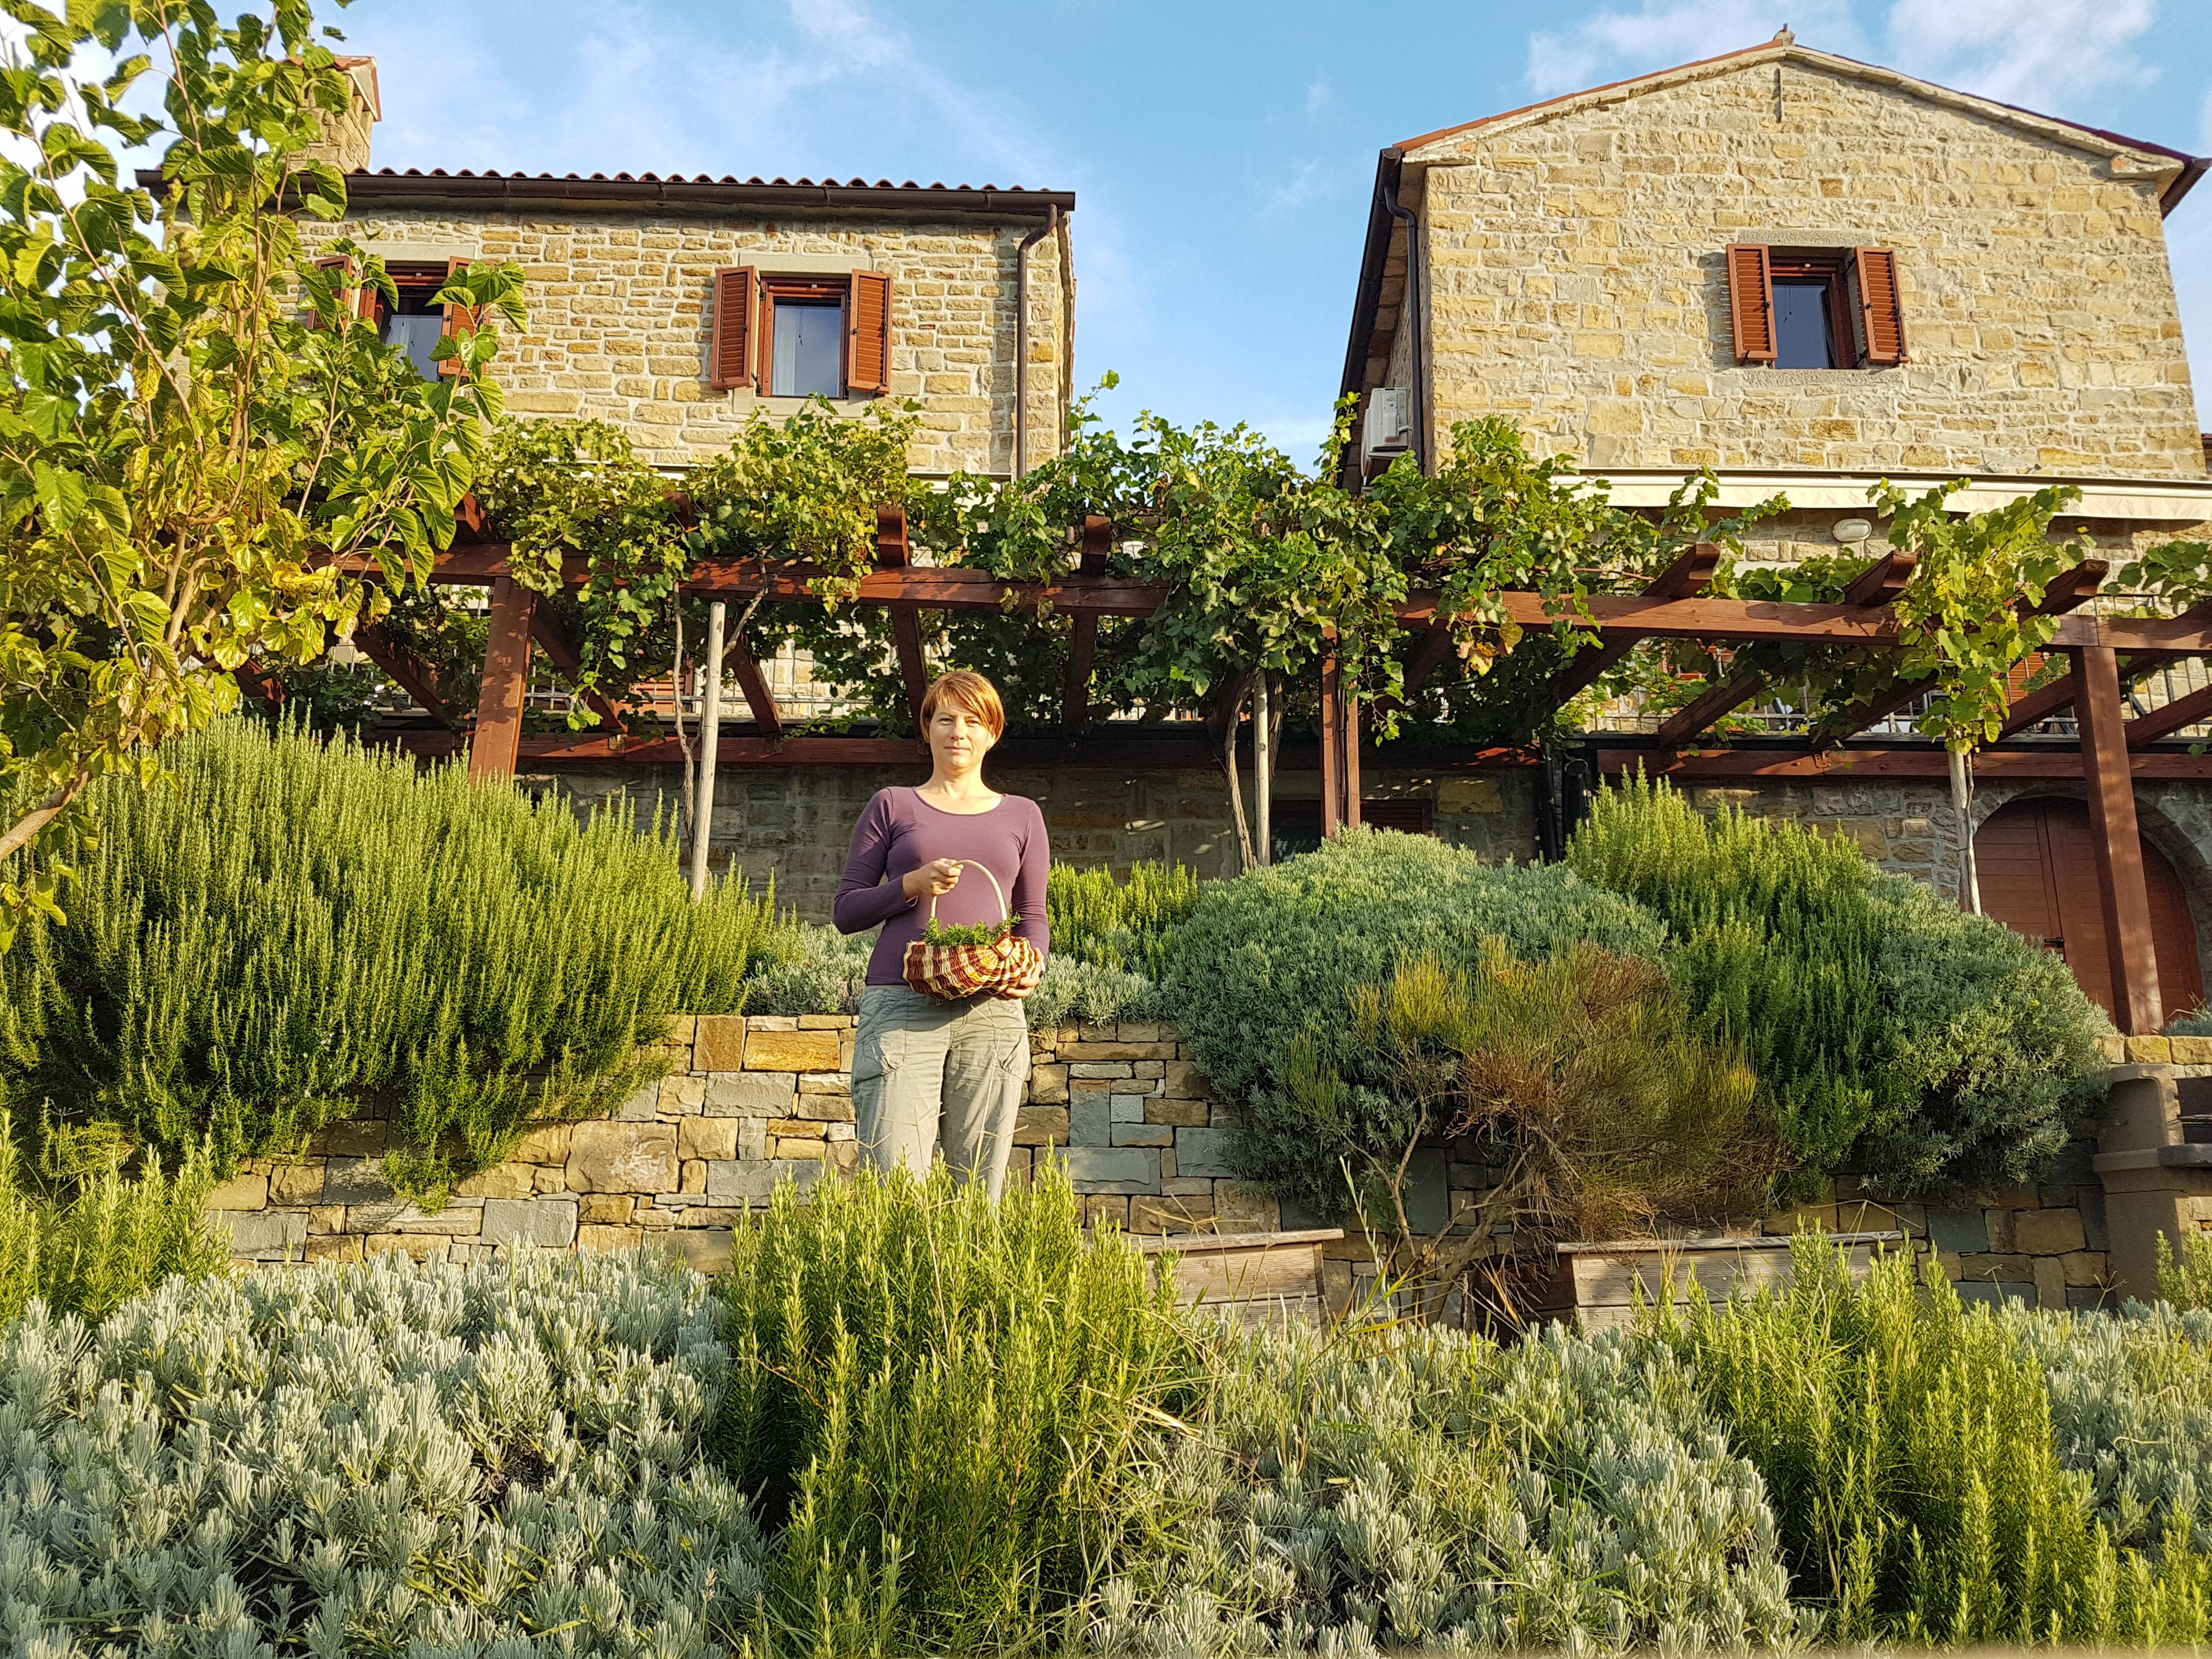 Istrian stone houses padna - Jerneja Vitežnik, top eco-friendly host